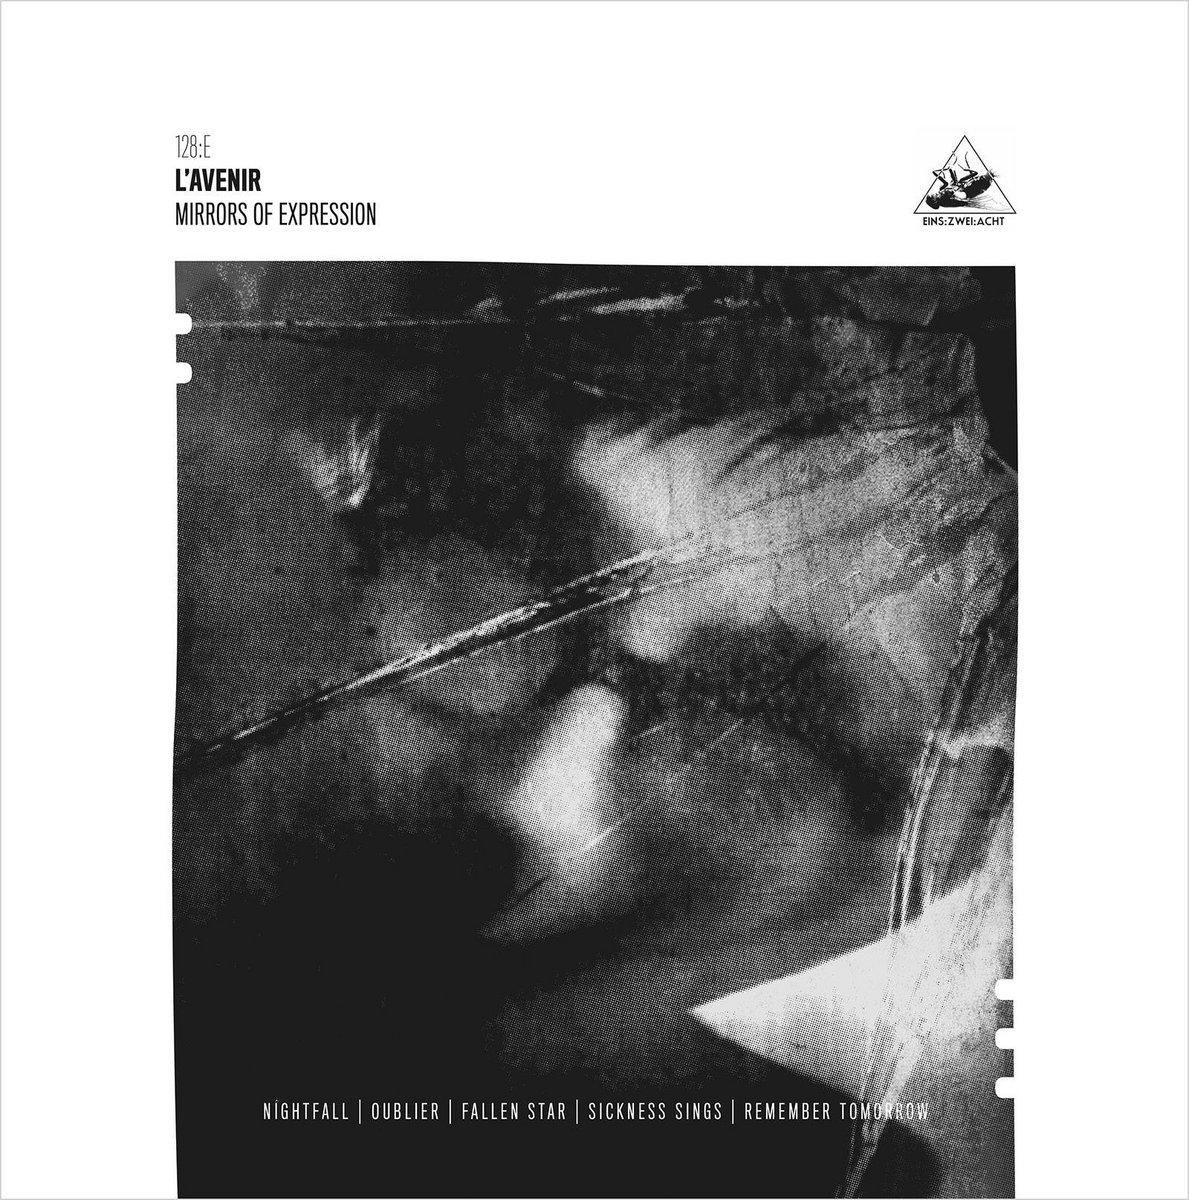 Mirrors of Expression | L'Avenir